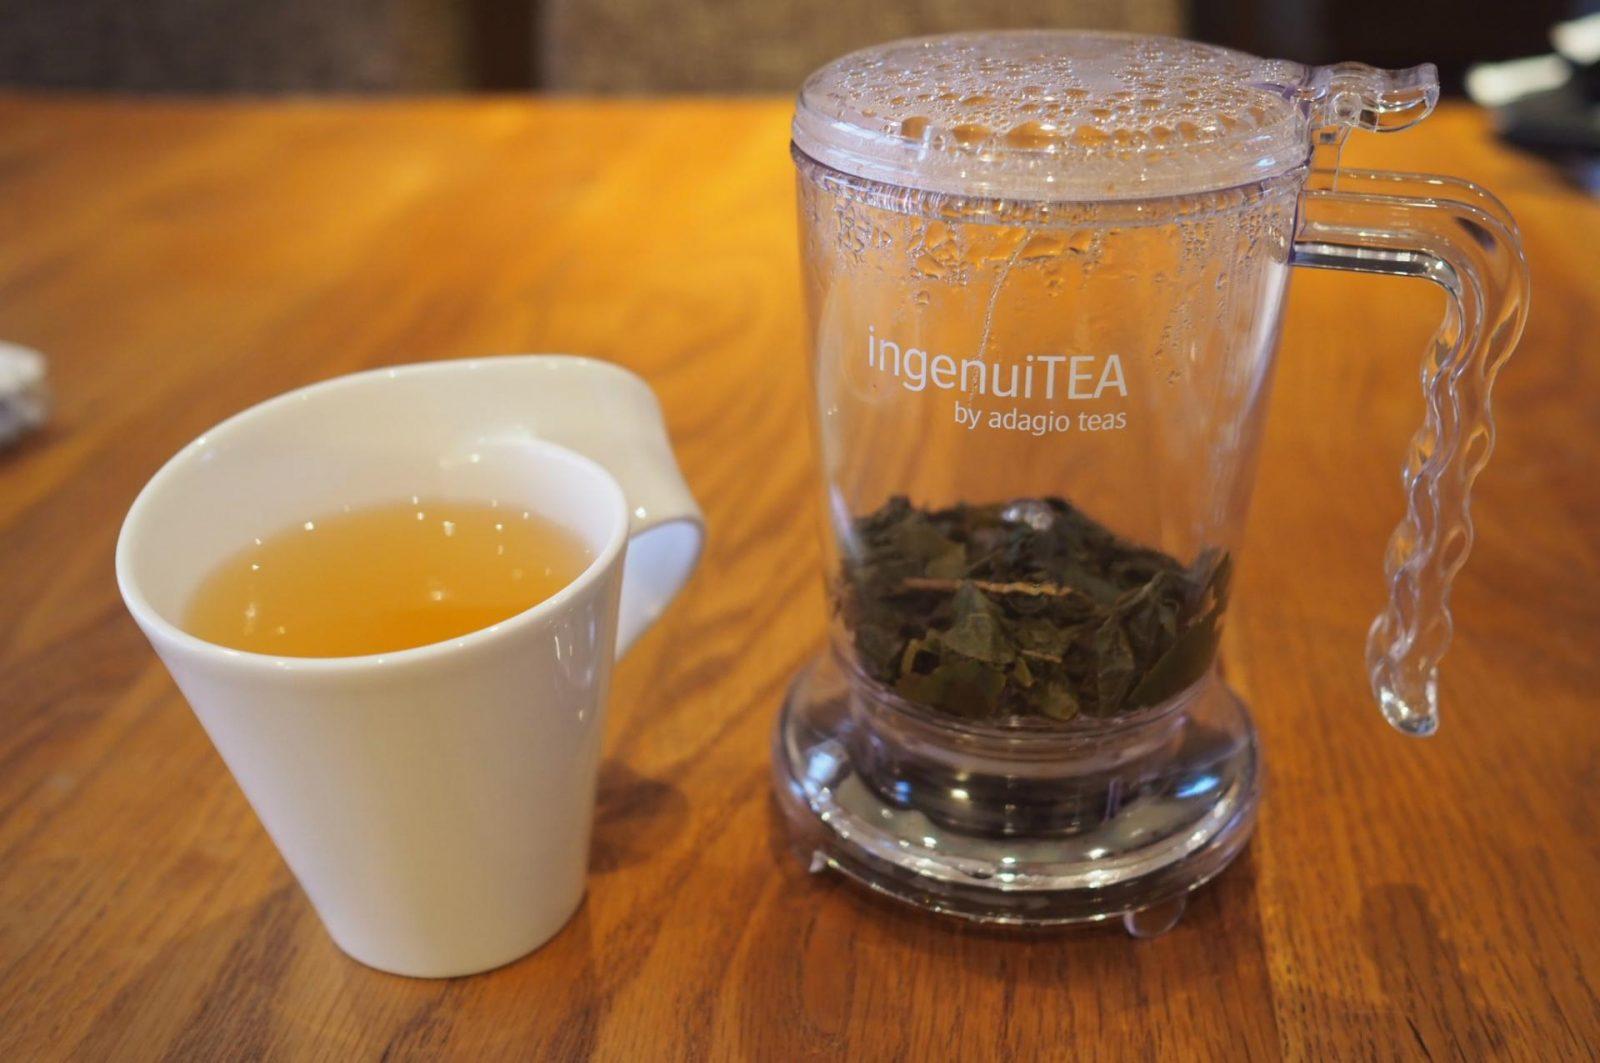 adagio tea maker